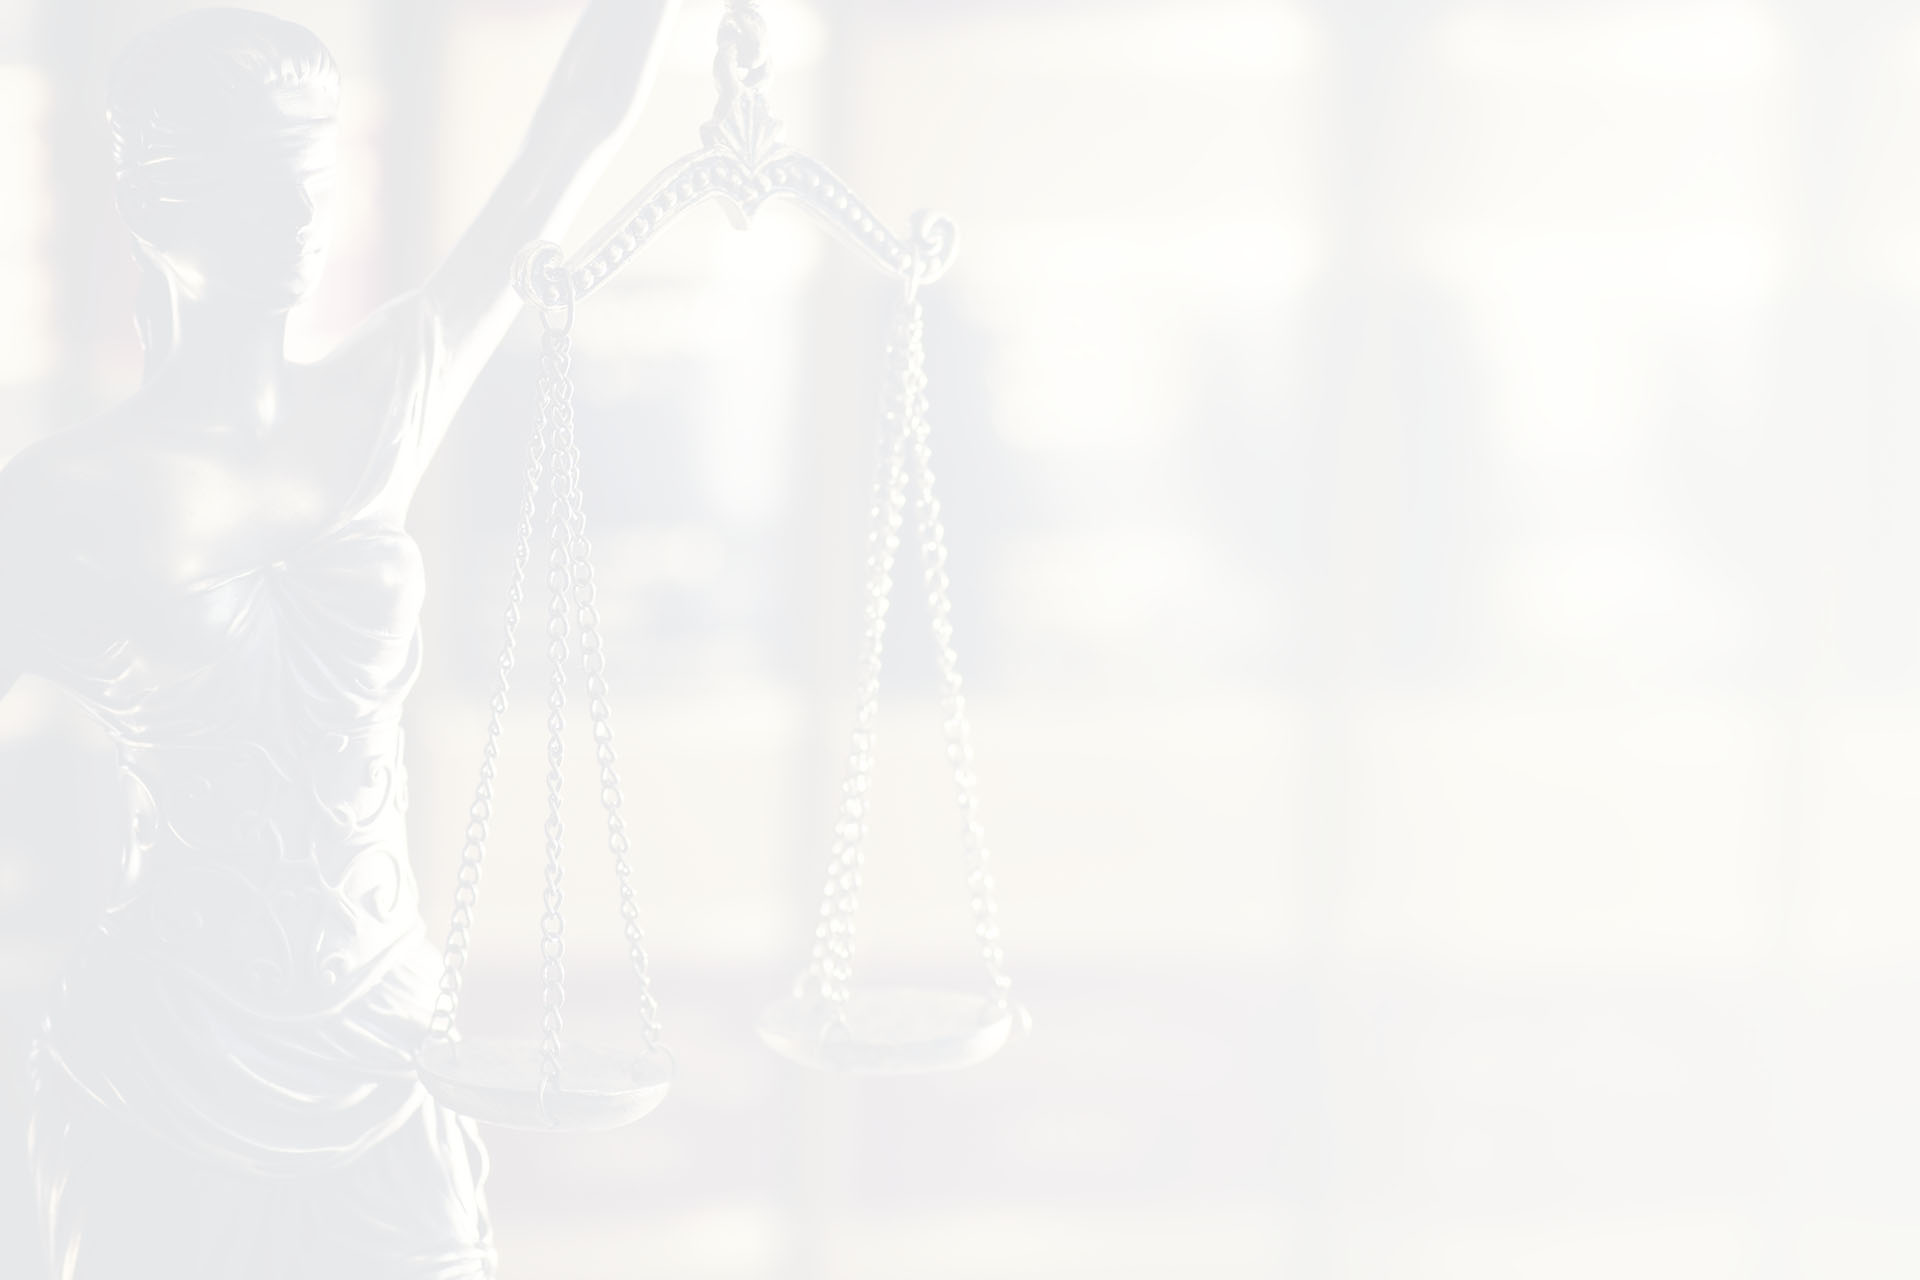 دفتر وکالت آل محمد - وکالت و مشاوره حقوقی